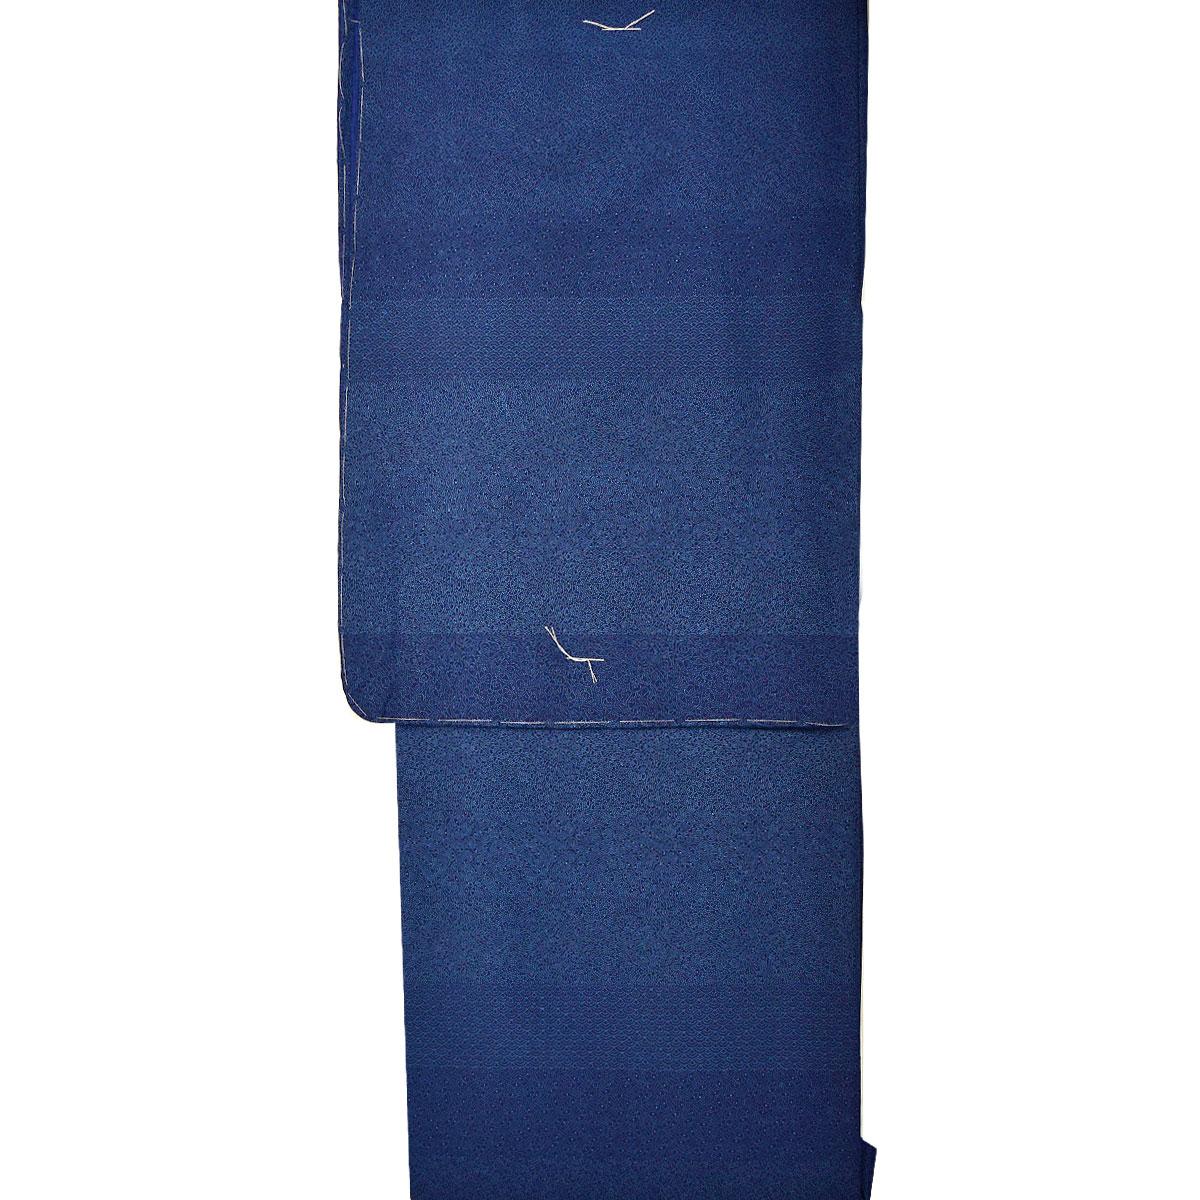 【M寸】 洗える着物 【 袷 】【 江戸小紋 】 【 仕立て上がり 】 洗える 着物 単品商品番号d914-59